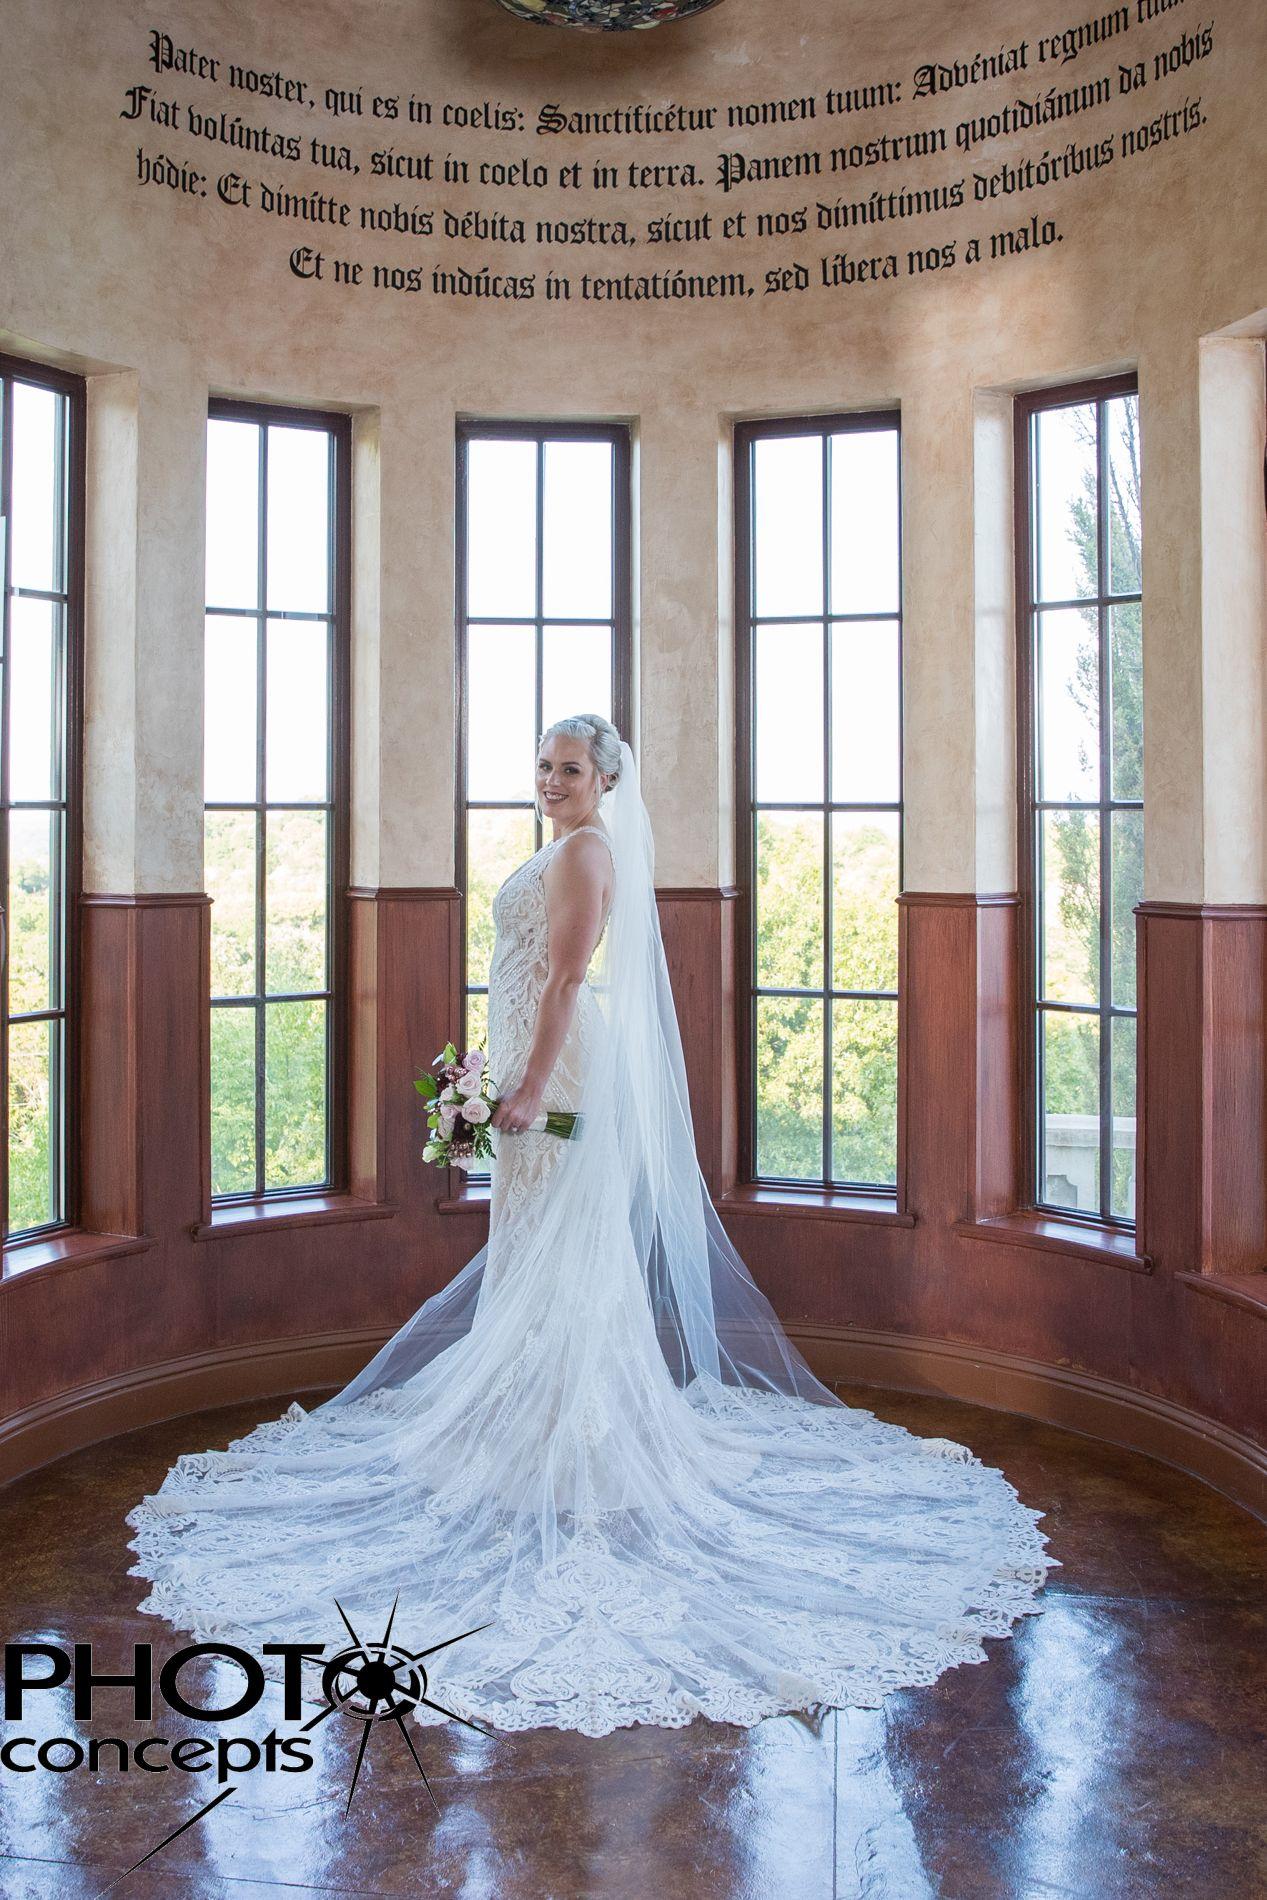 Beautiful bride in rotunda with Latin script writing at ...